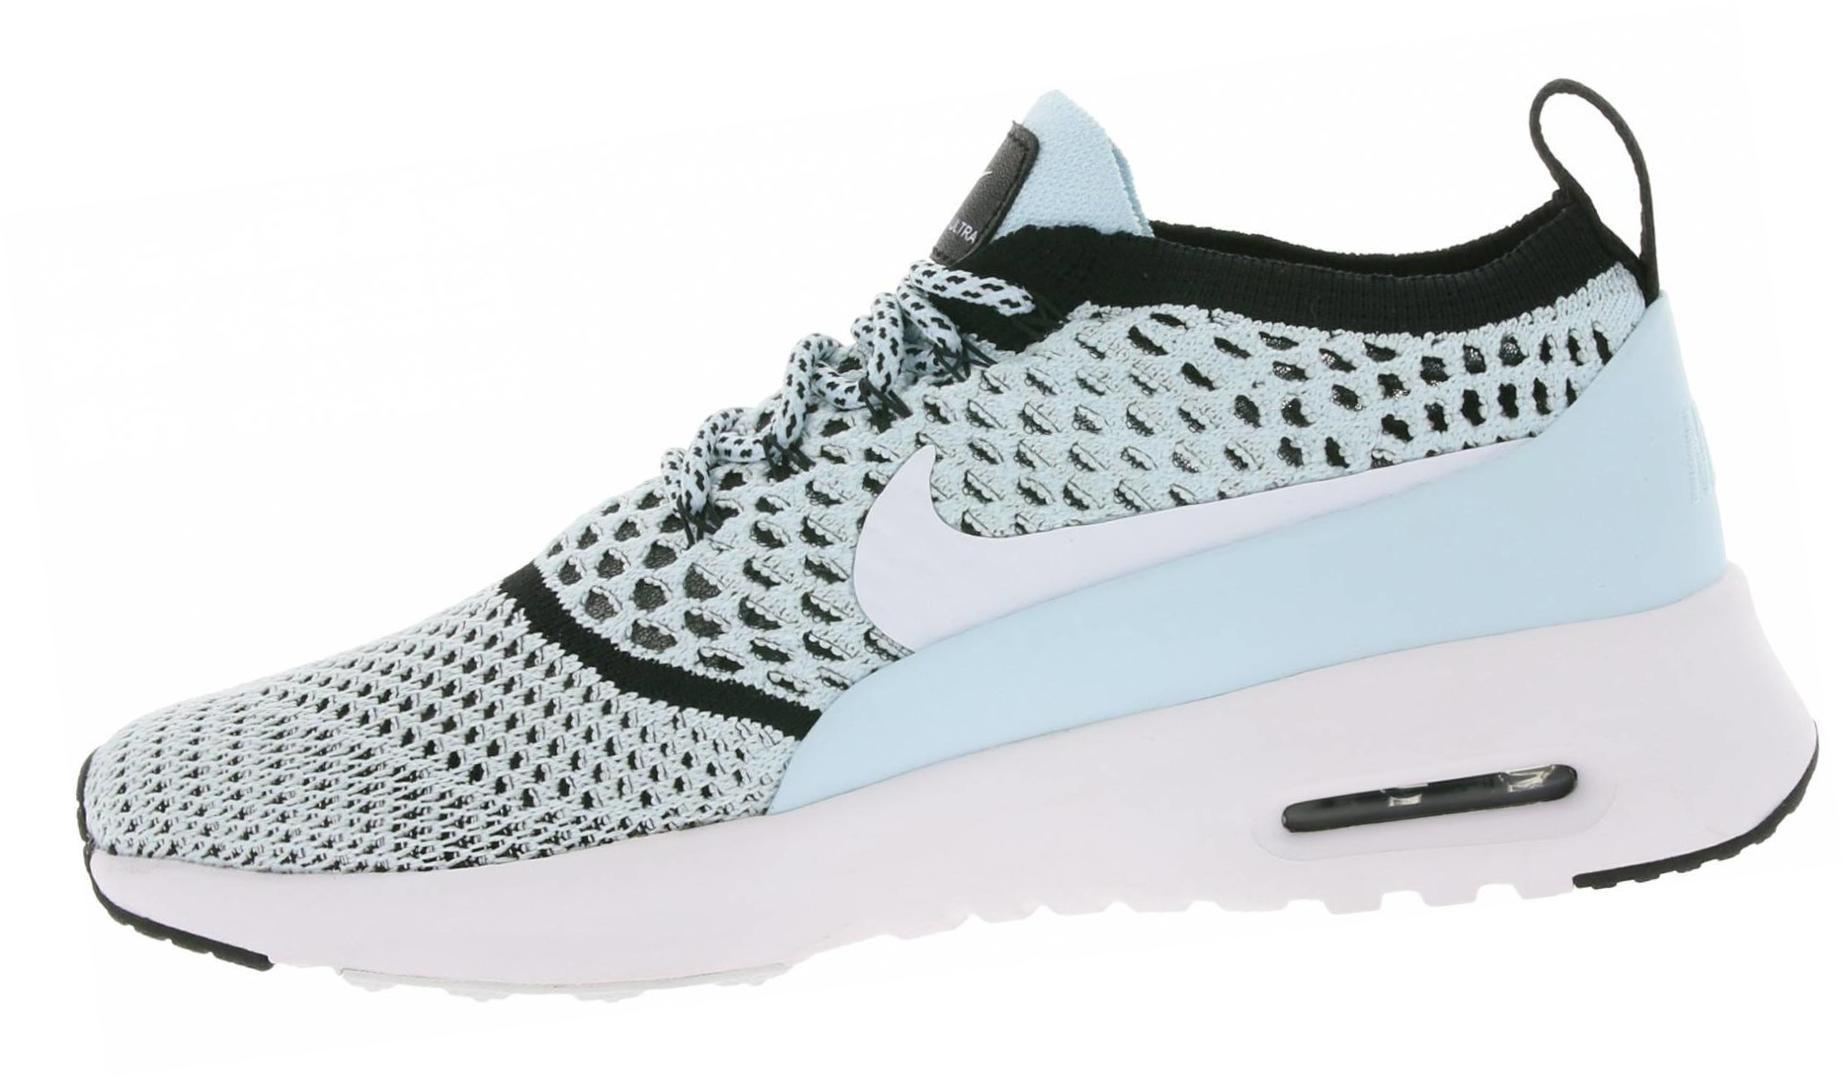 9 причин для покупки и 4 минуса кроссовок Nike Air Max